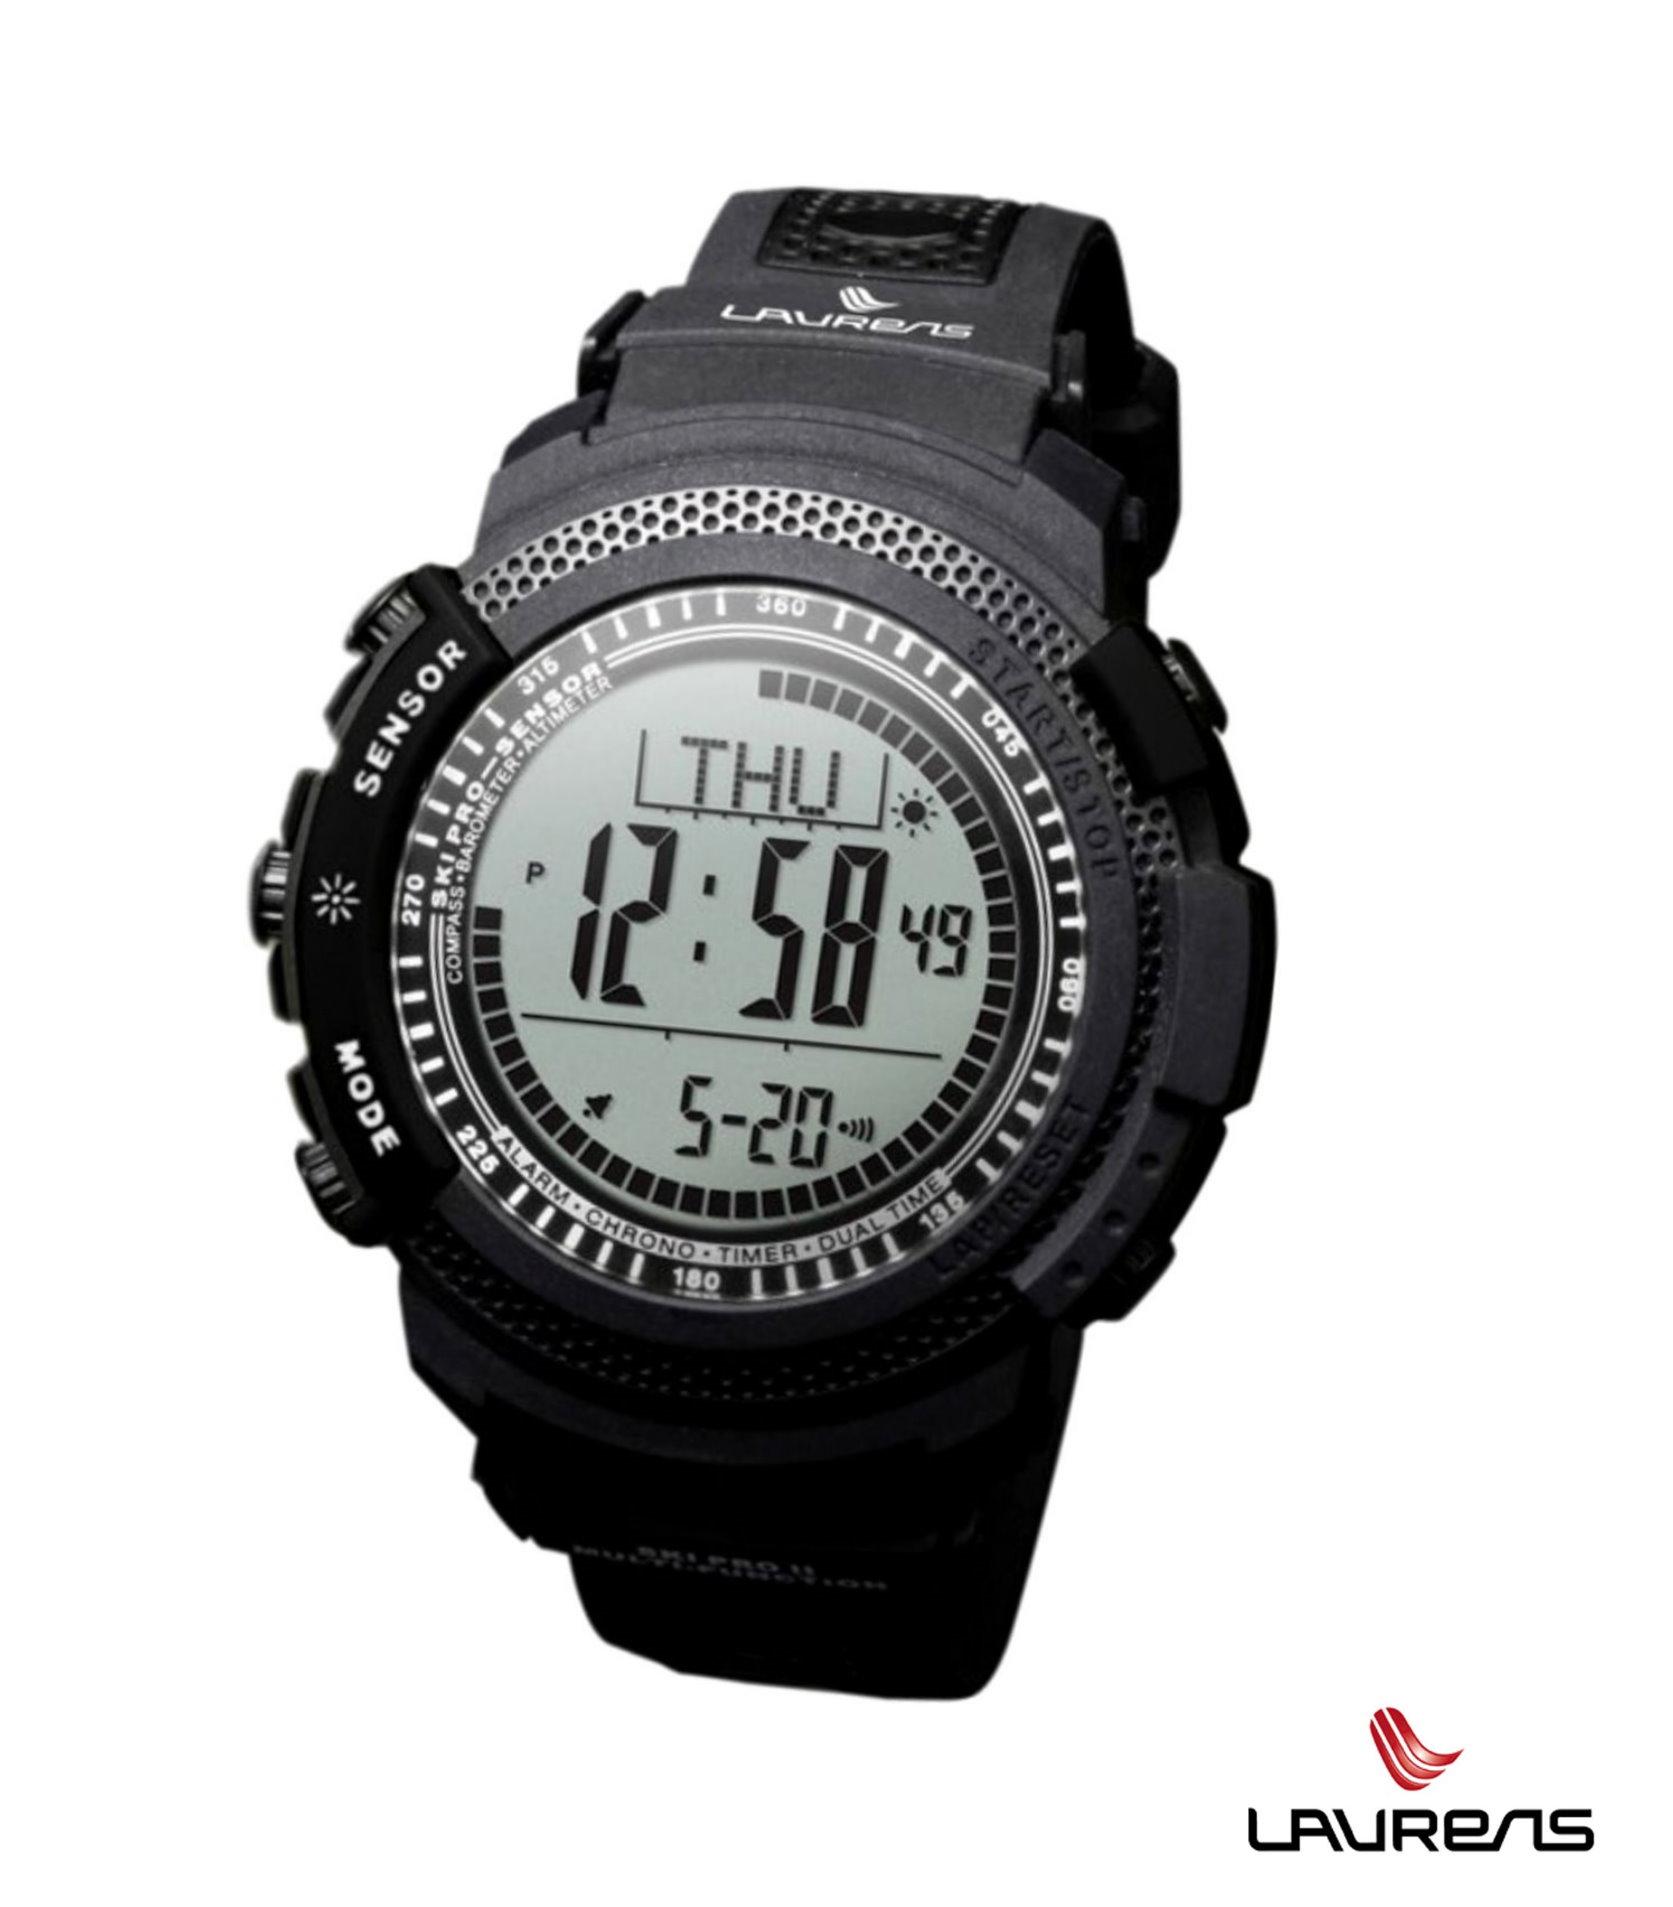 Outdoorové hodinky SKi PRO nero